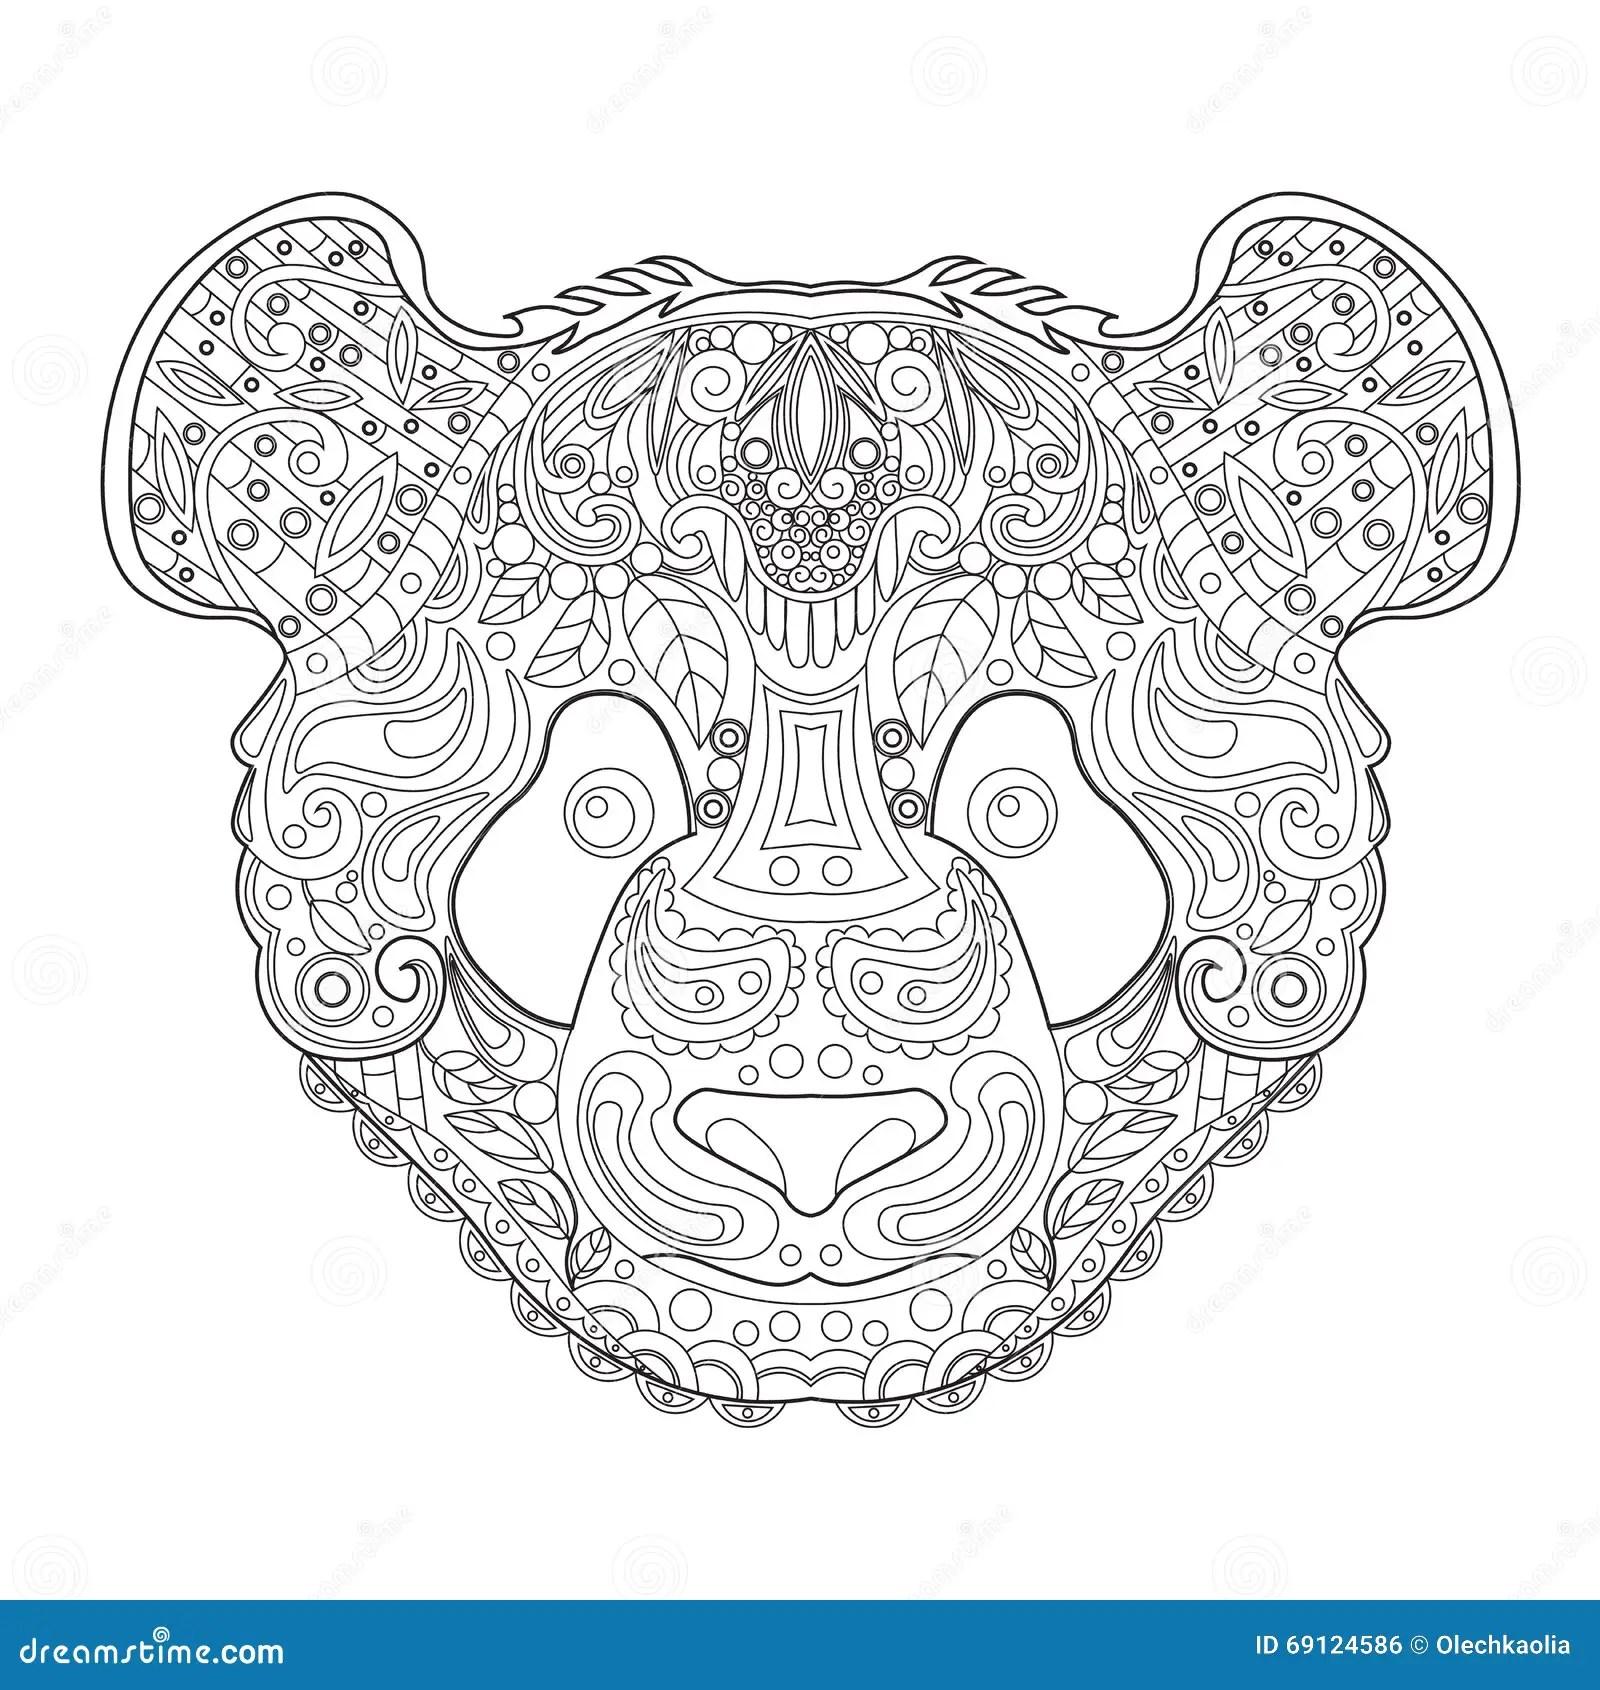 Ethnic Zentagle Ornate Hand Drawn Panda Head Black And